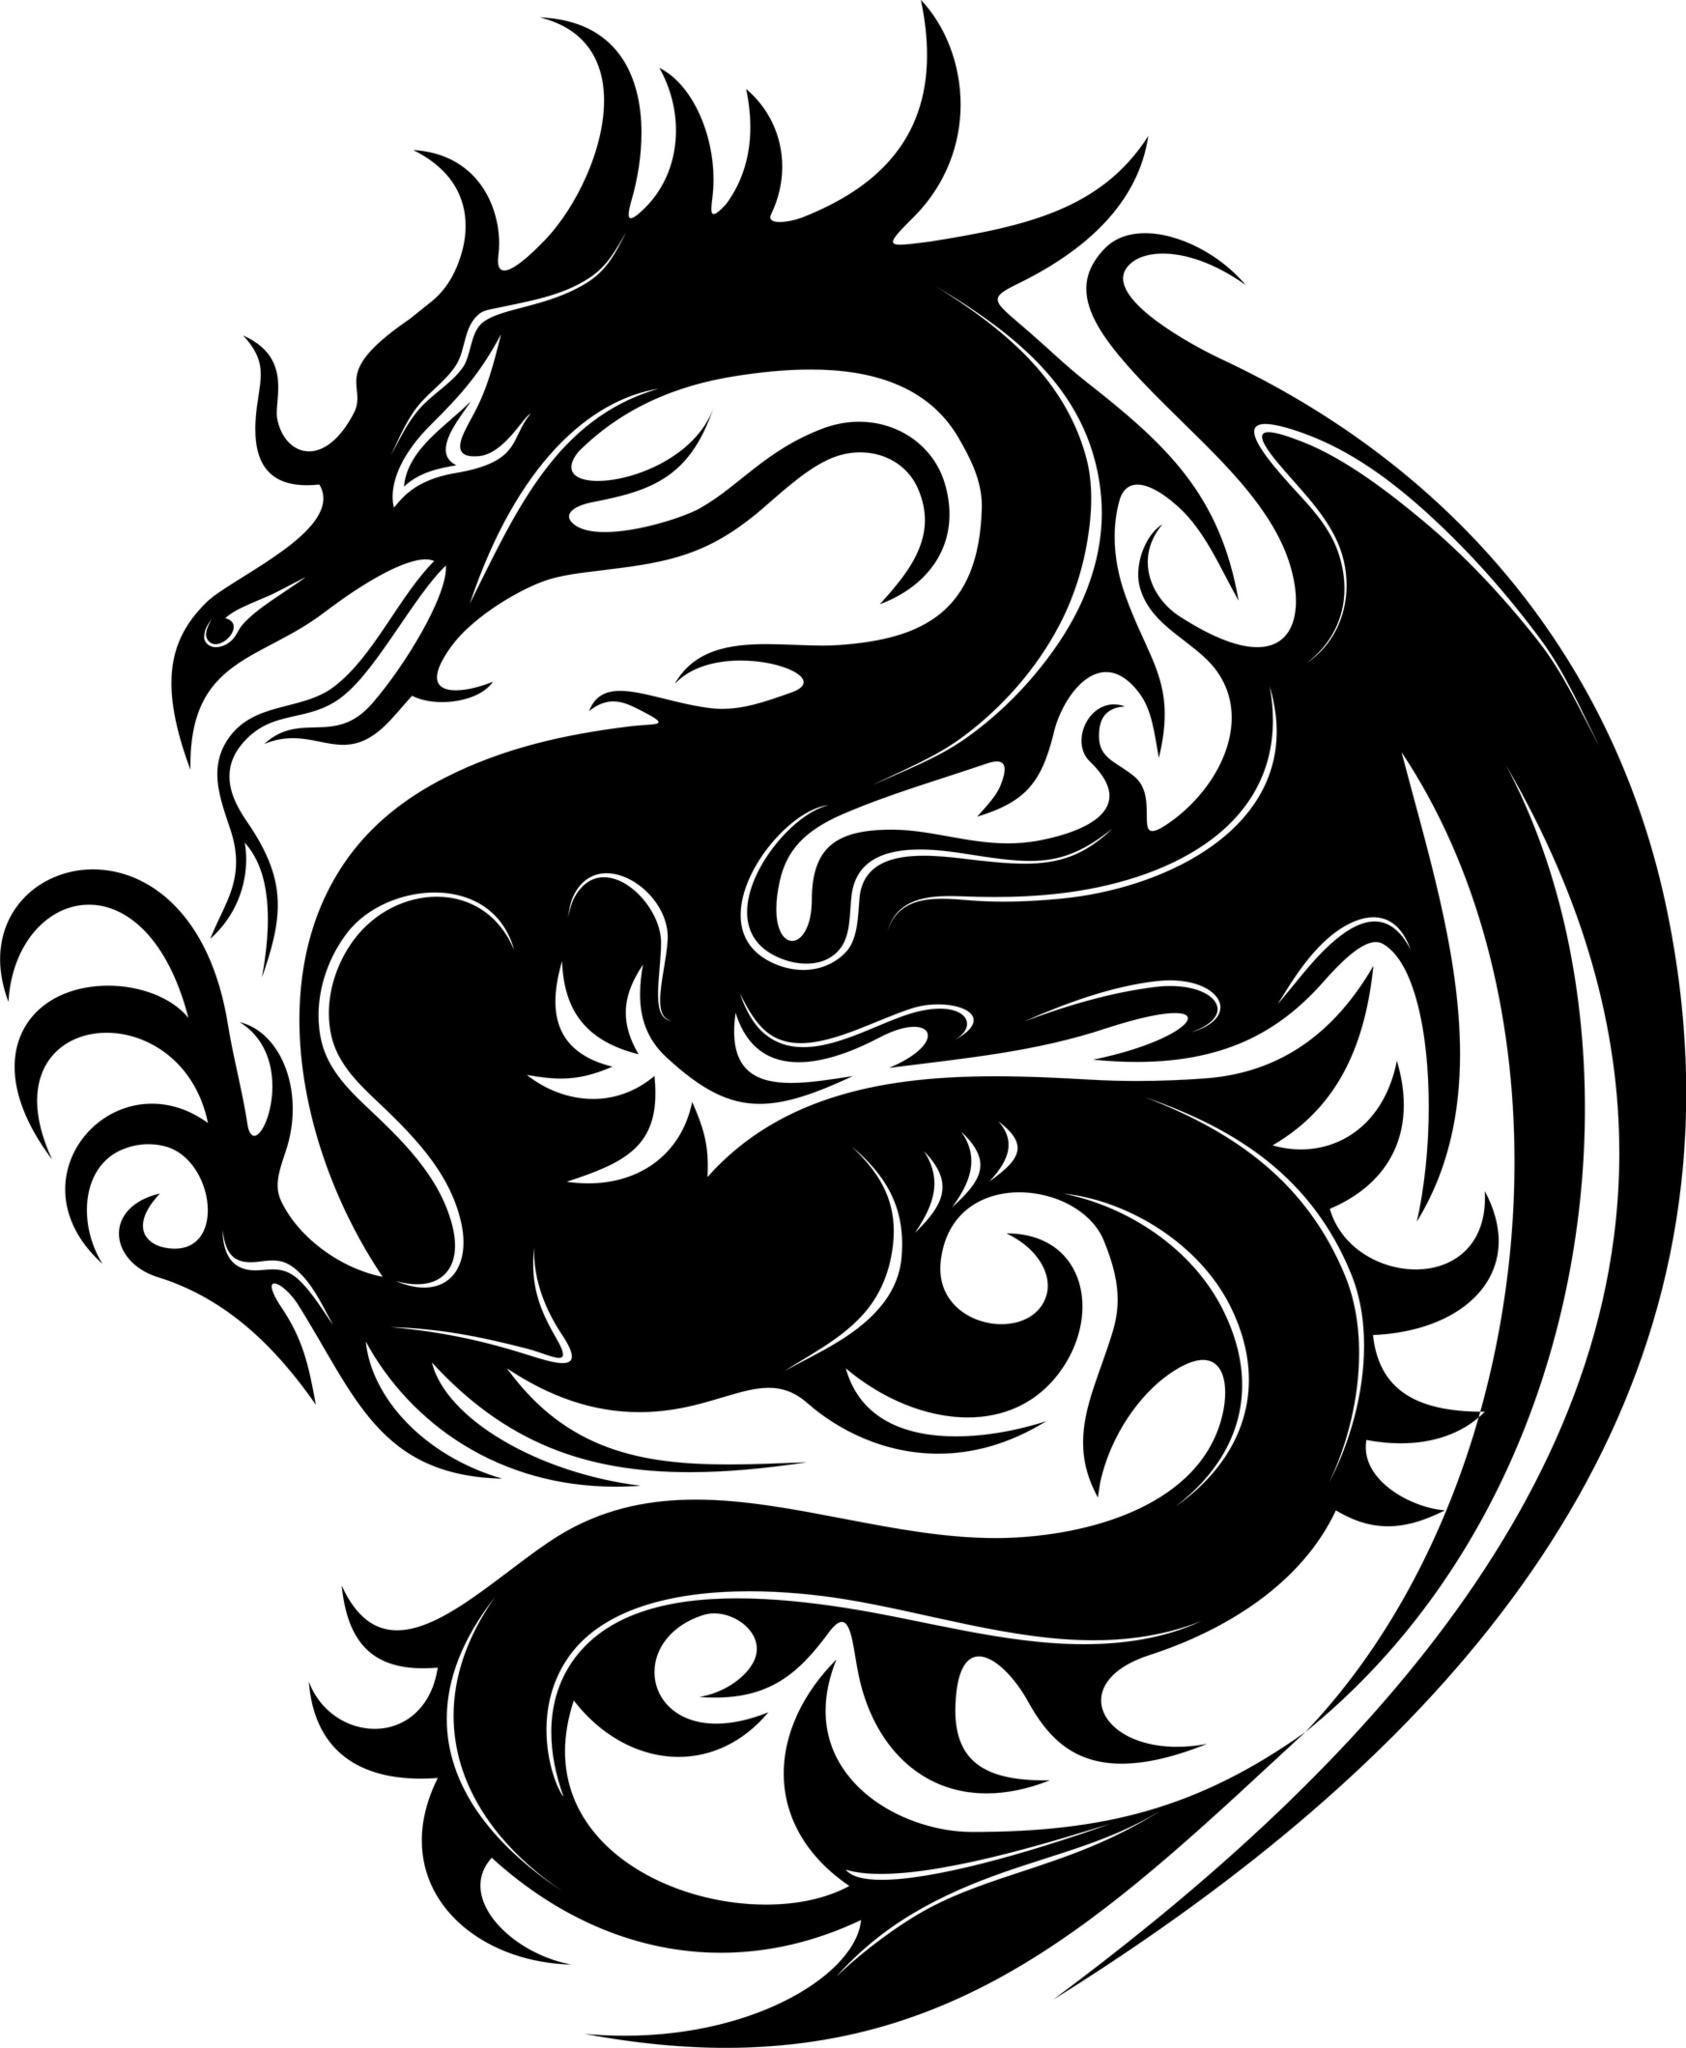 dragon stencil google search dragon stencil designs pinterest stenciling dragons and. Black Bedroom Furniture Sets. Home Design Ideas